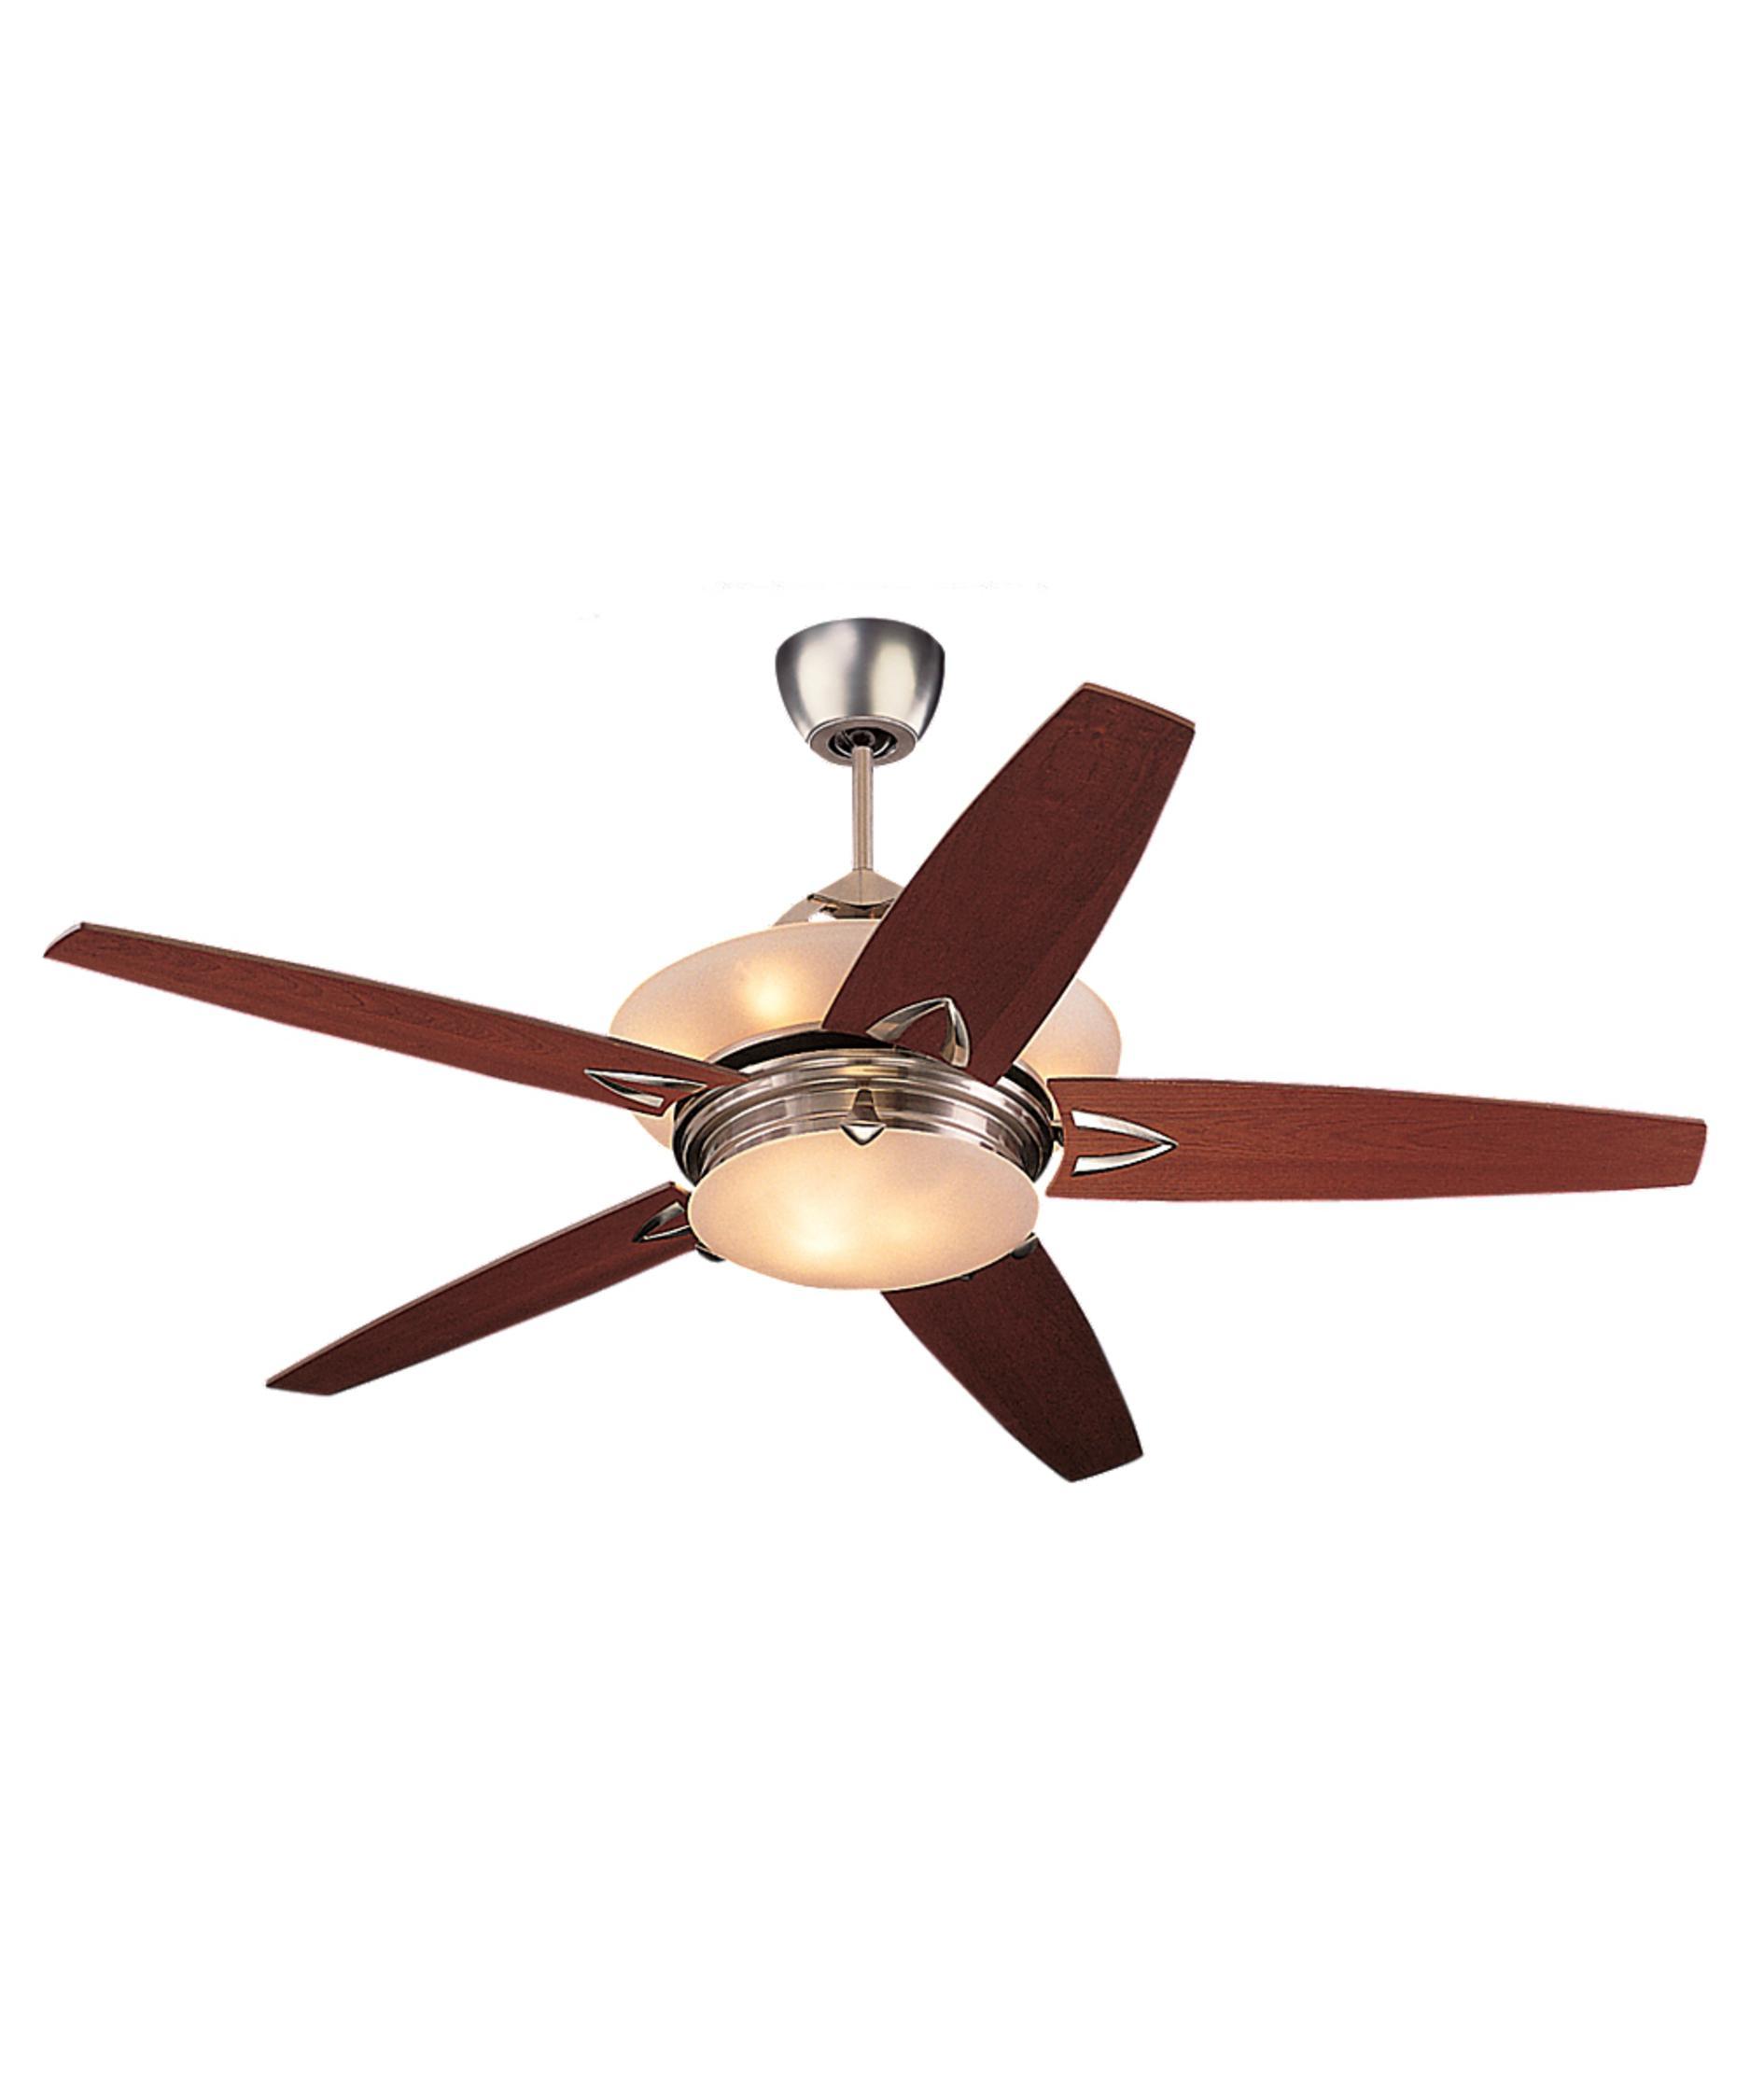 monte carlo 5ahr60 arch 60 inch 5 blade ceiling fan | capitol